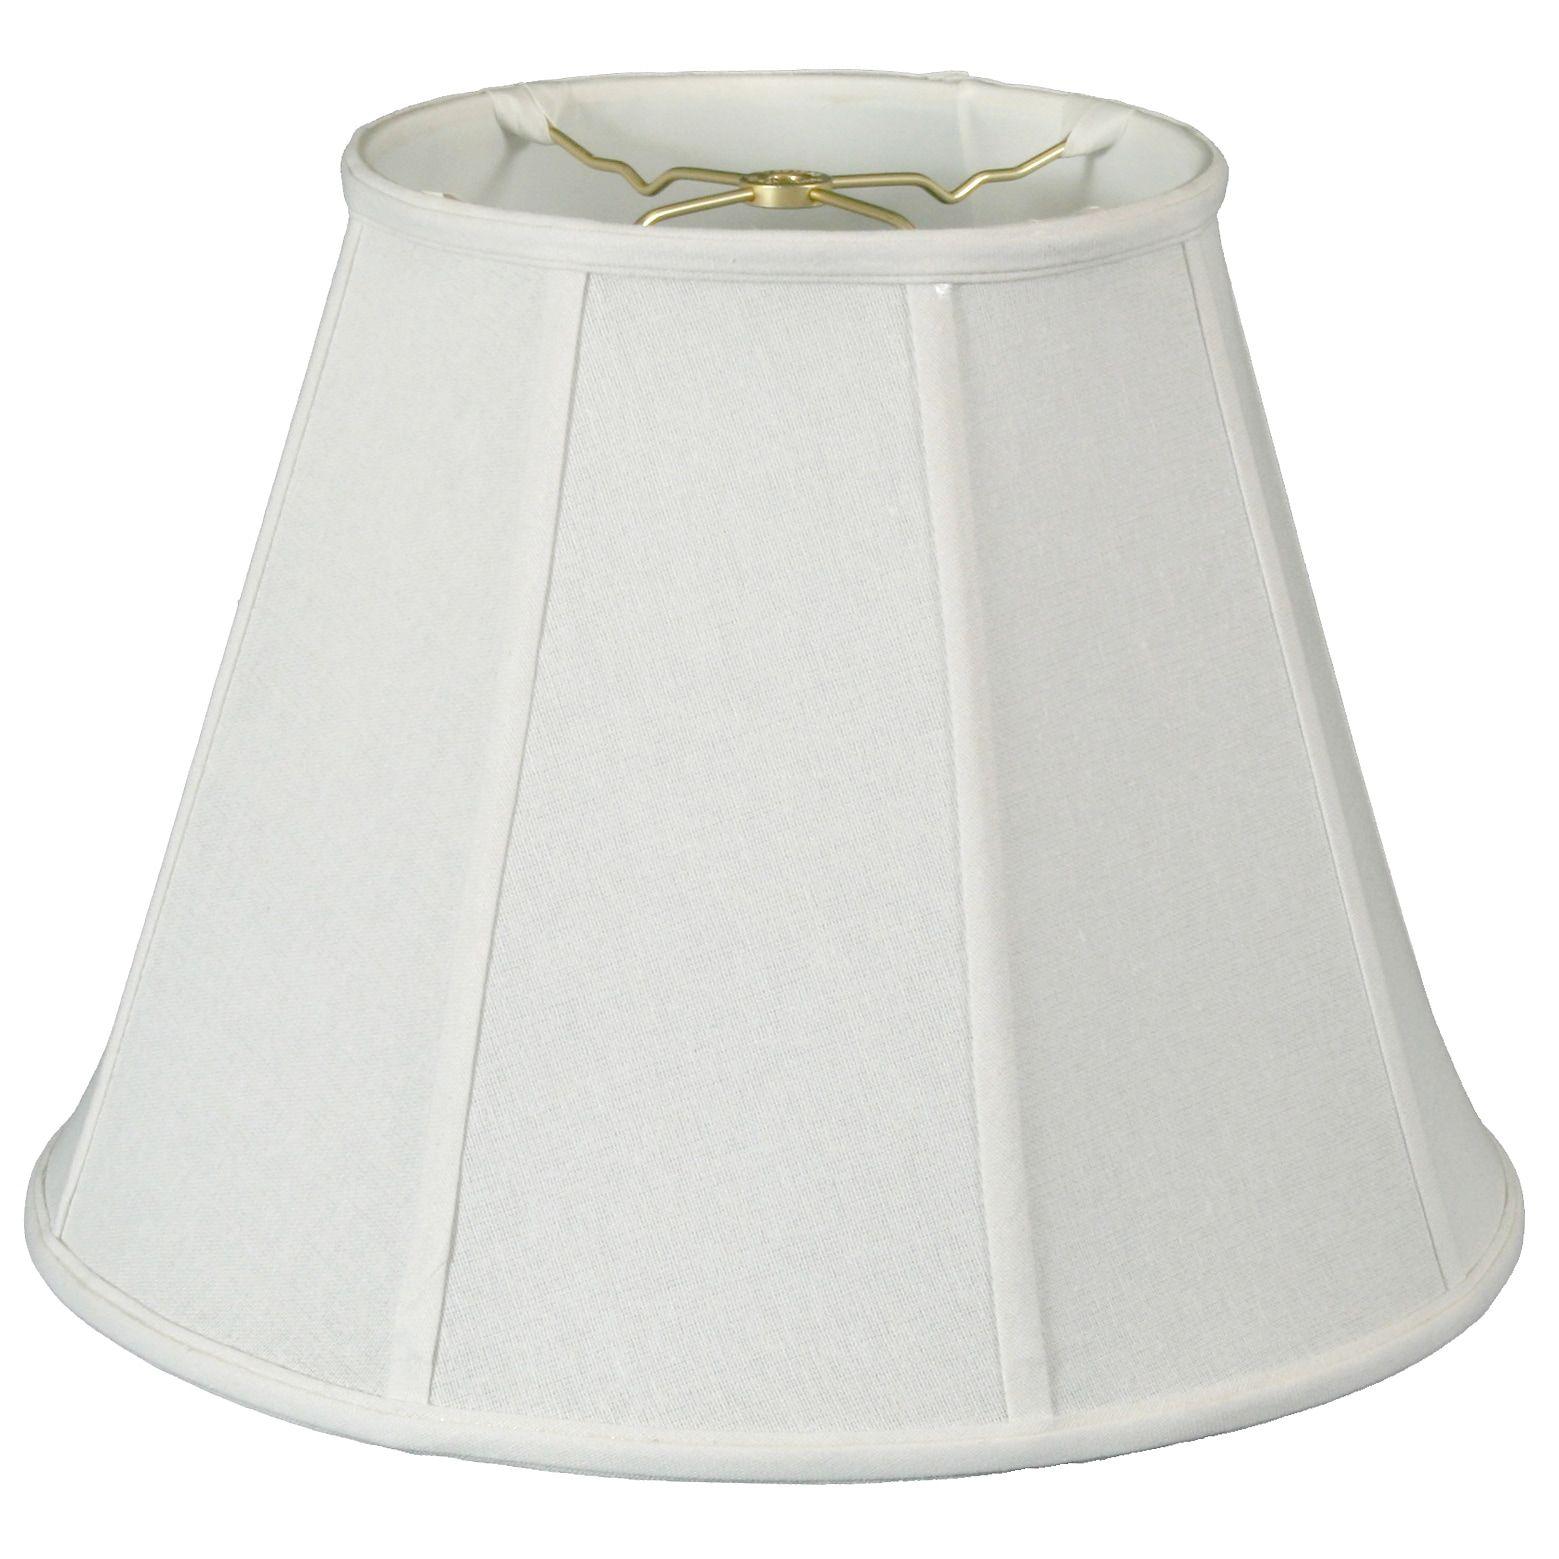 Royal Designs Deep Empire Lamp Shade, Linen White, 6 x 12